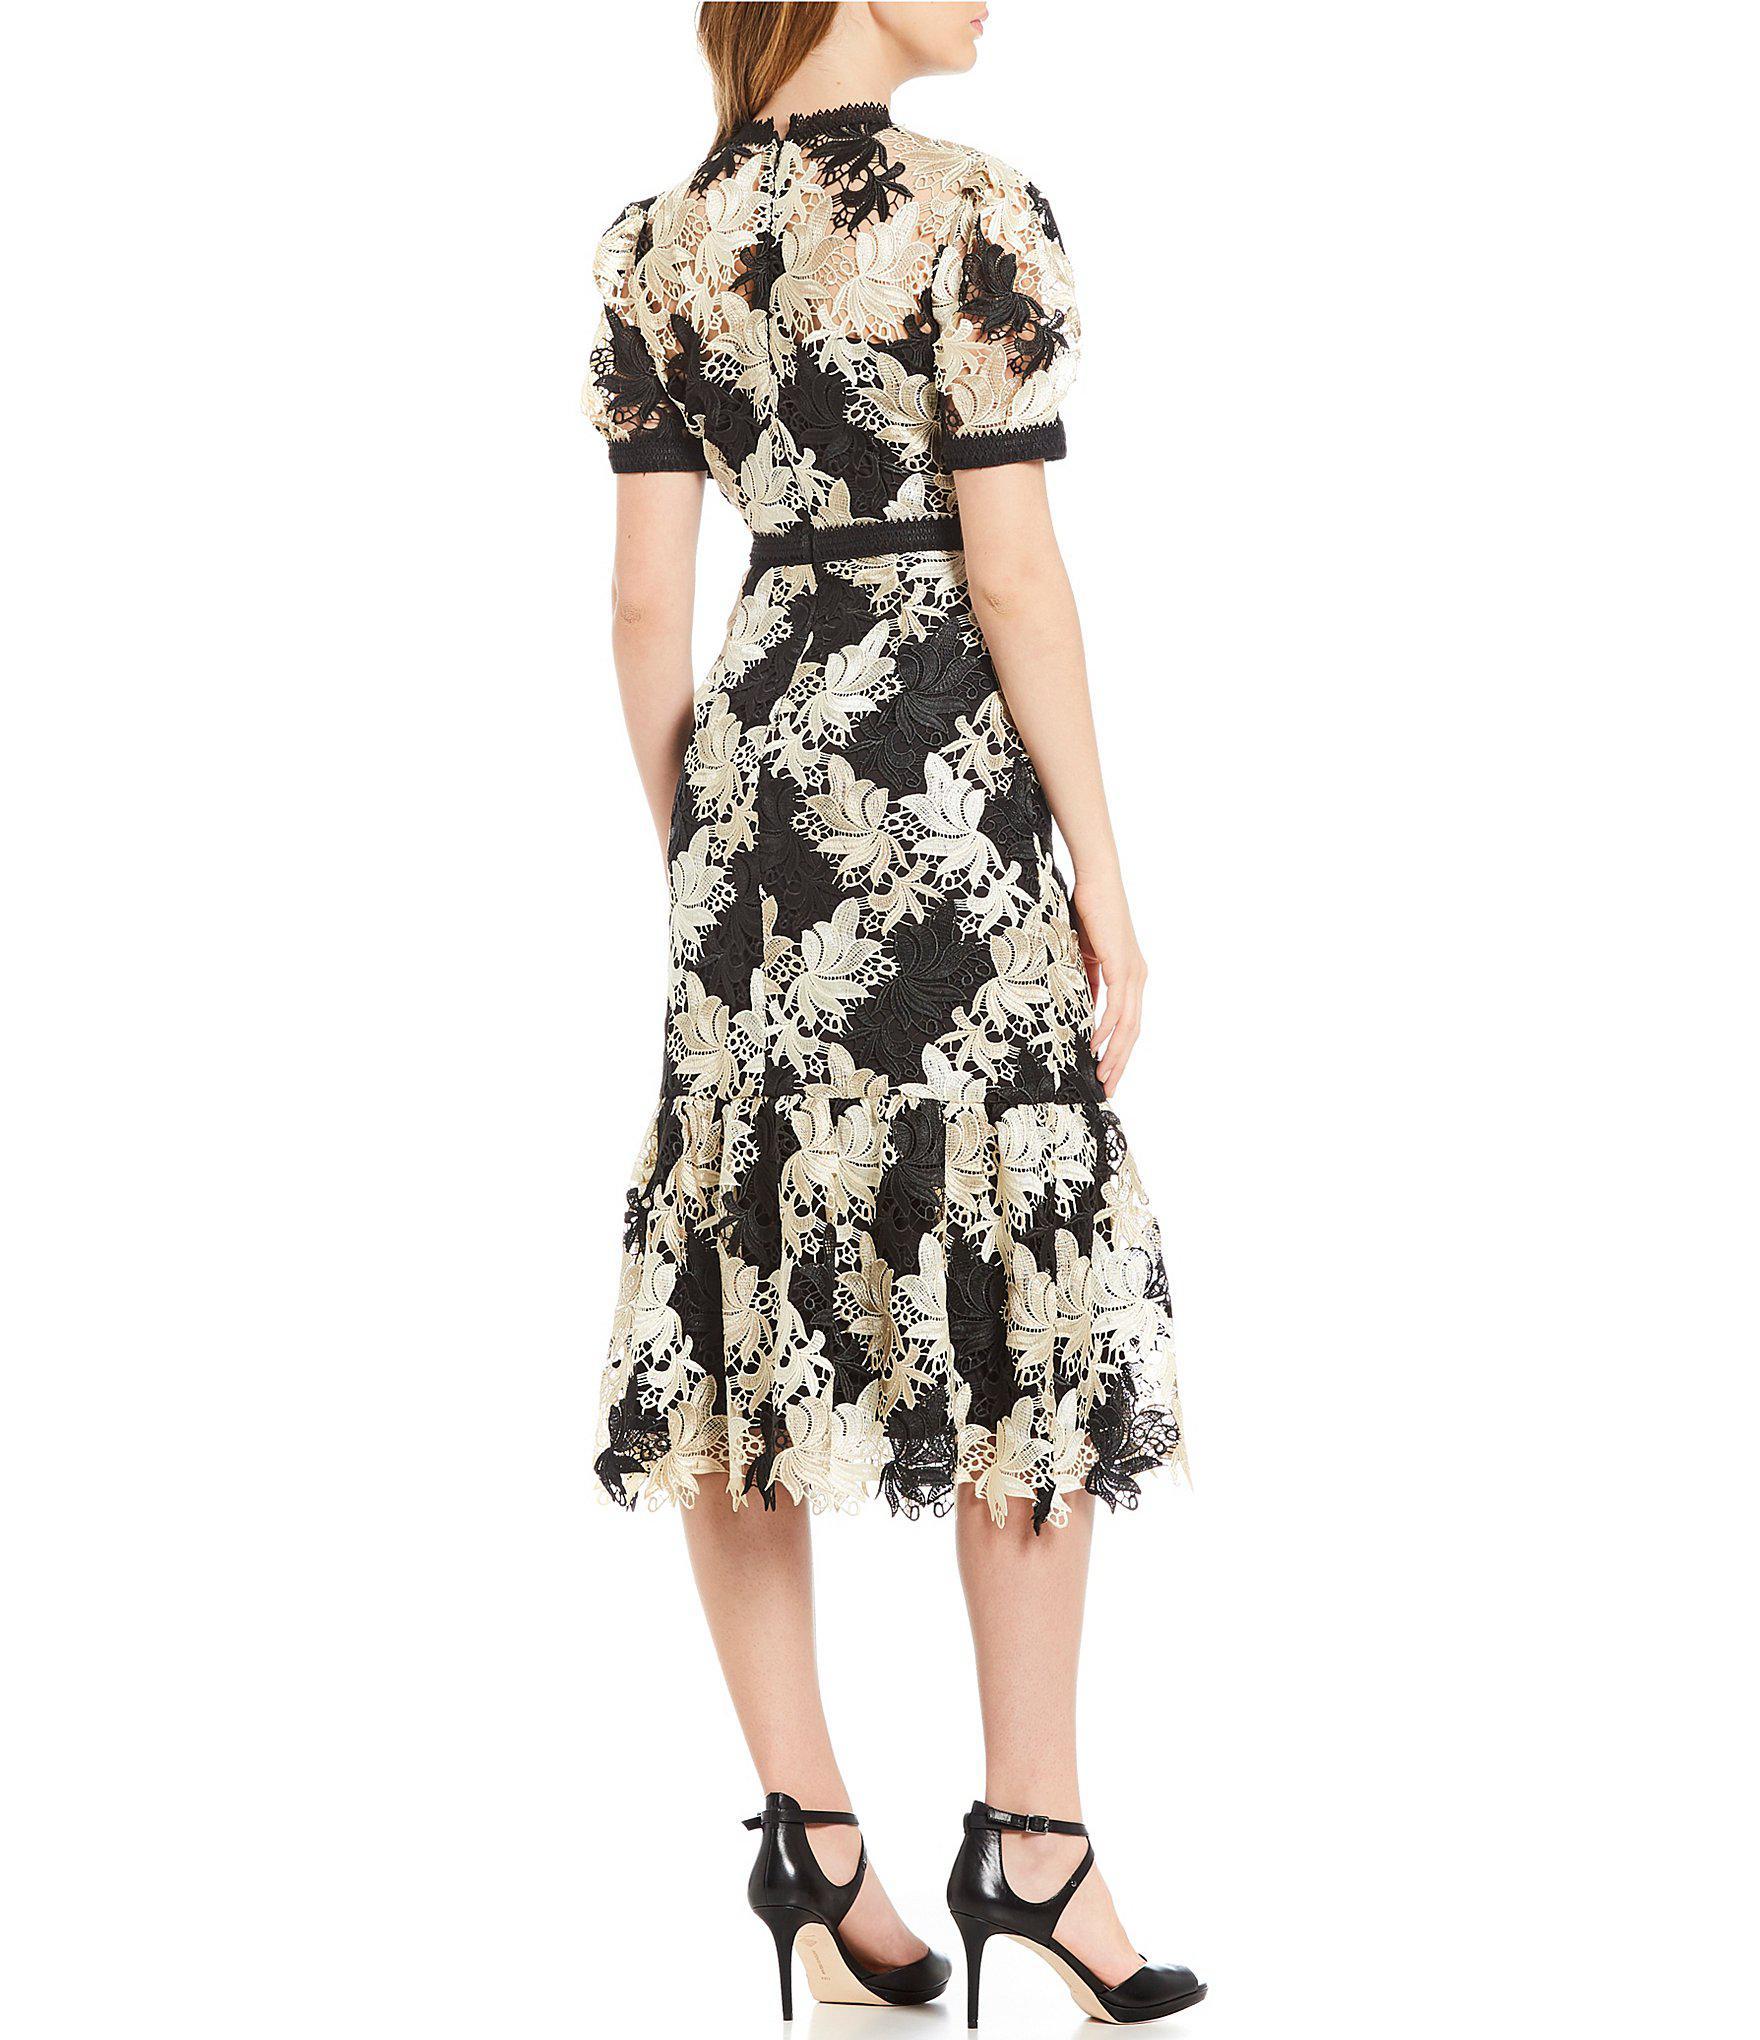 ce31ebbf2b Antonio Melani Tessa Lace Midi Dress in Black - Lyst